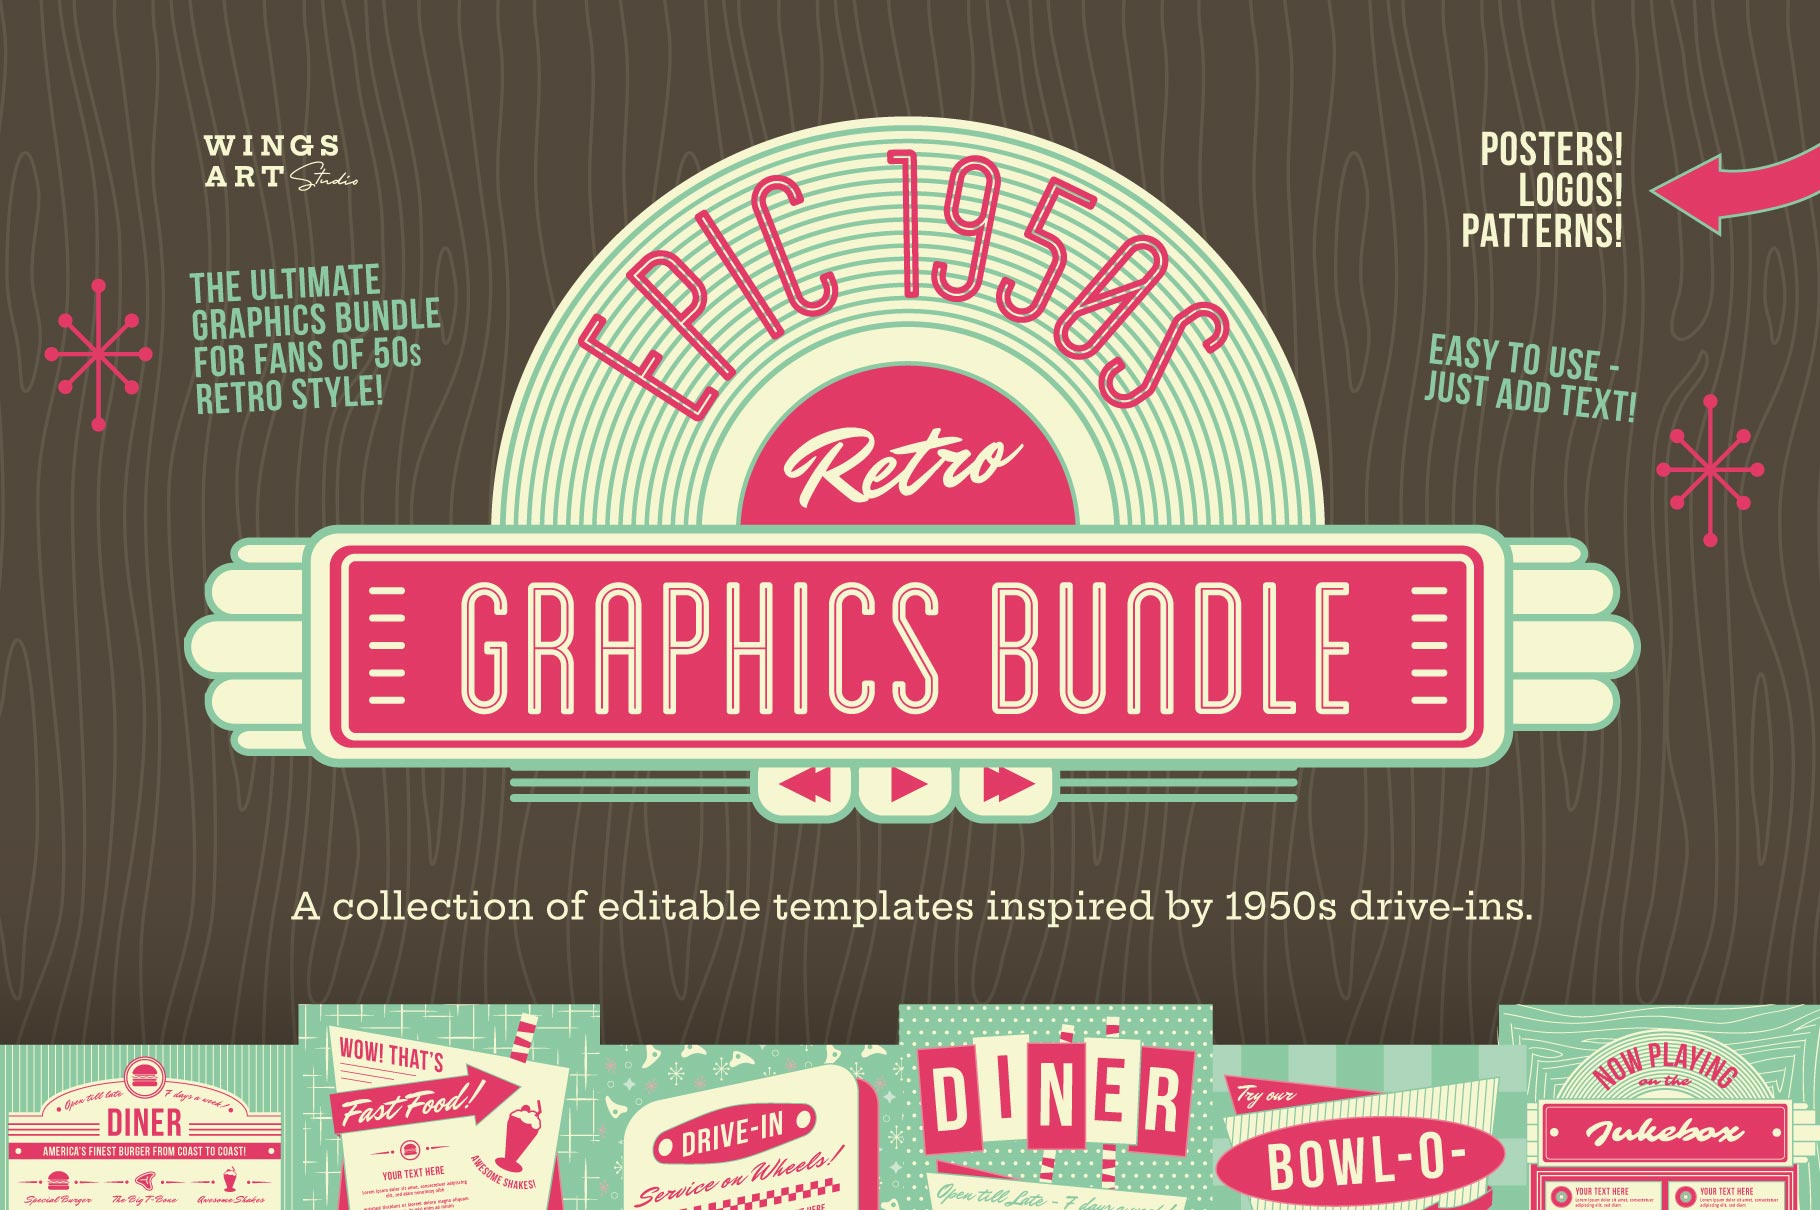 1950s Diner Graphics Bundle by Wingsart Studio